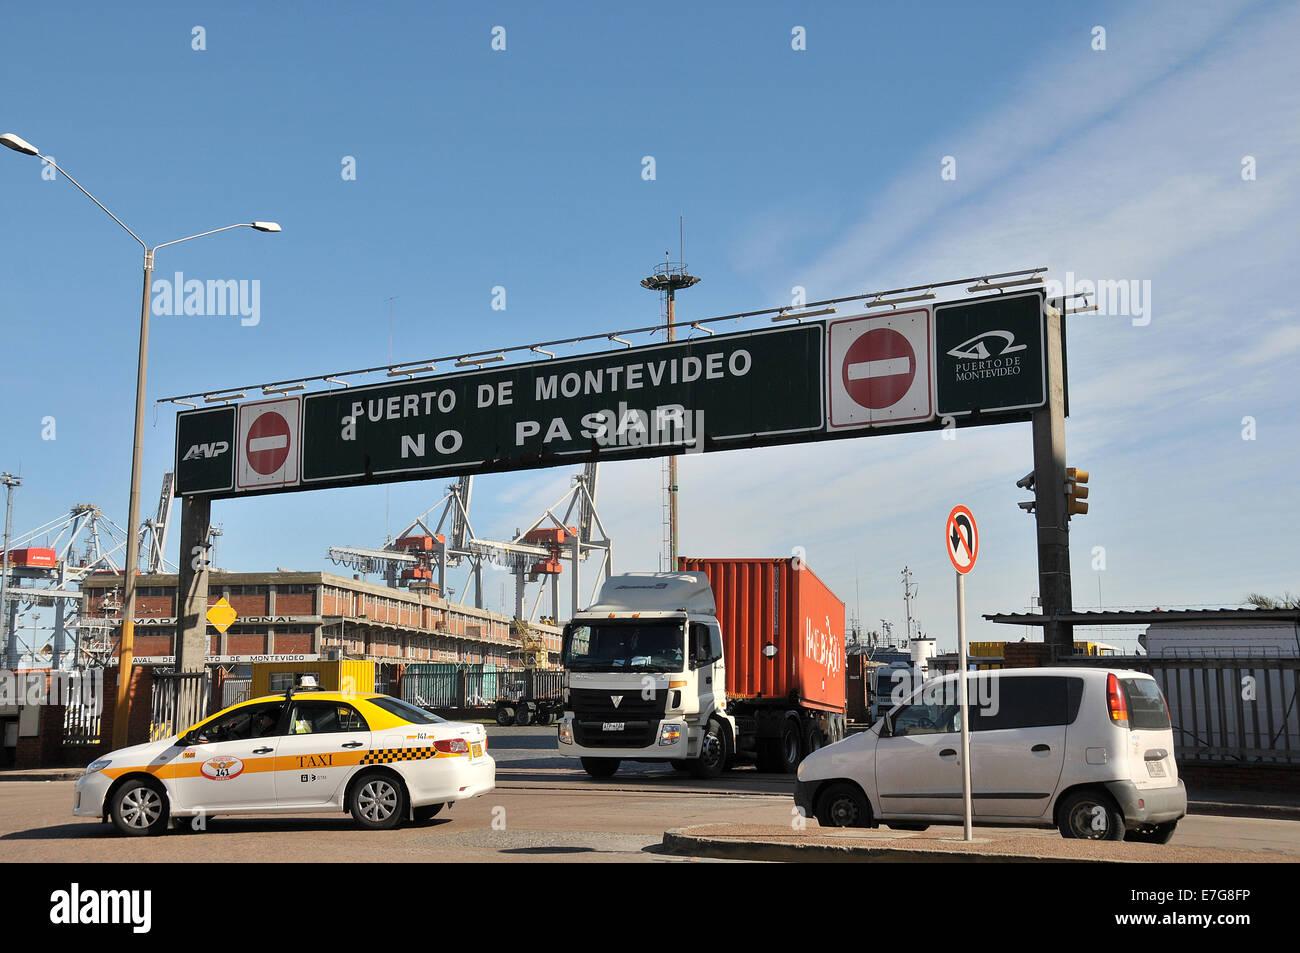 Puerto do Montevideo Uruguay Immagini Stock